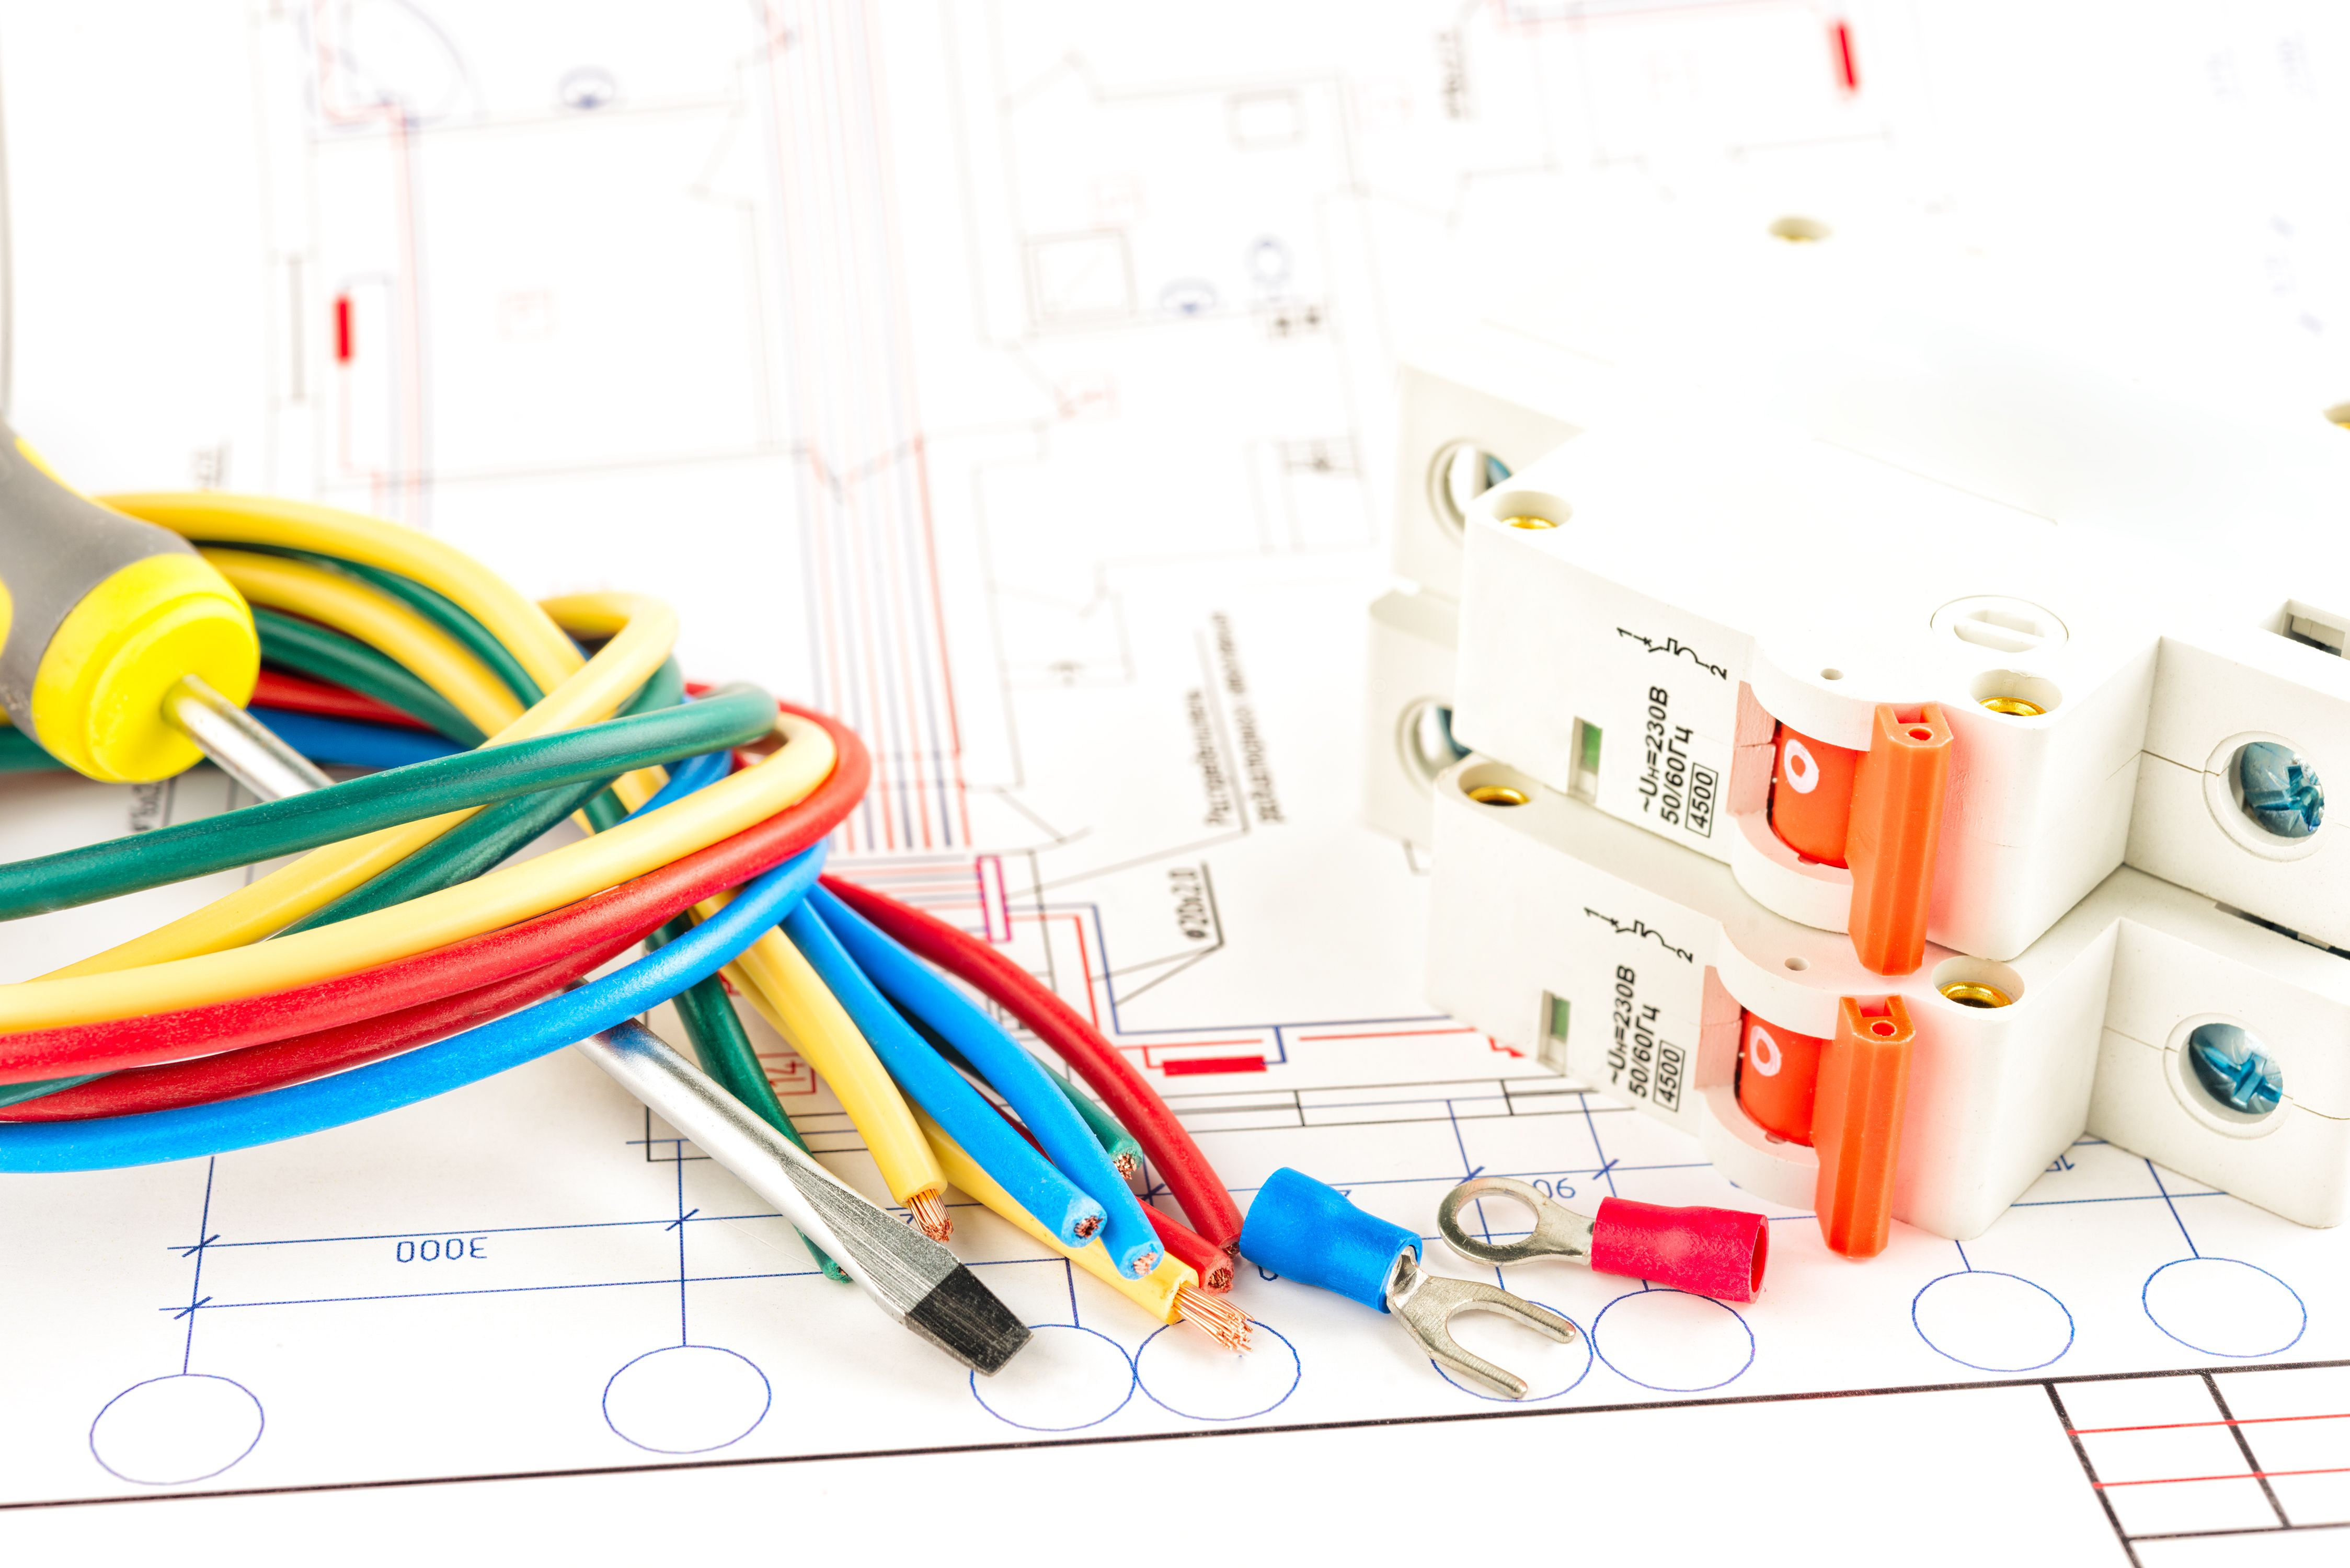 Montajes eléctricos en Vallecas